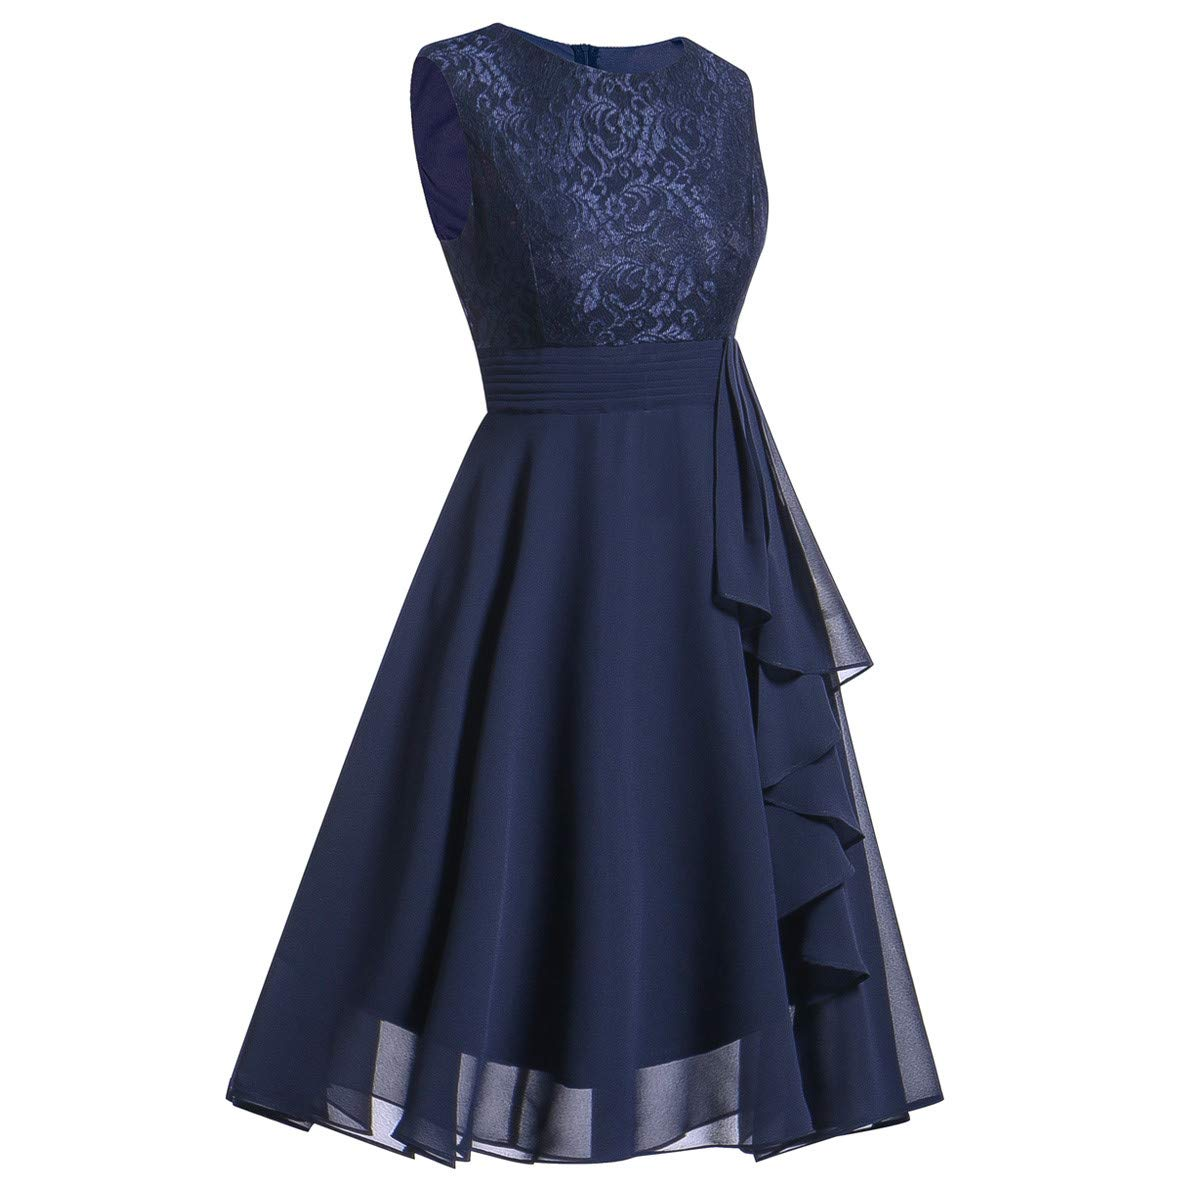 Rambling Women Lace Long Dress,Ladies Sleeveless Formal Wedding Bridesmaid Dress